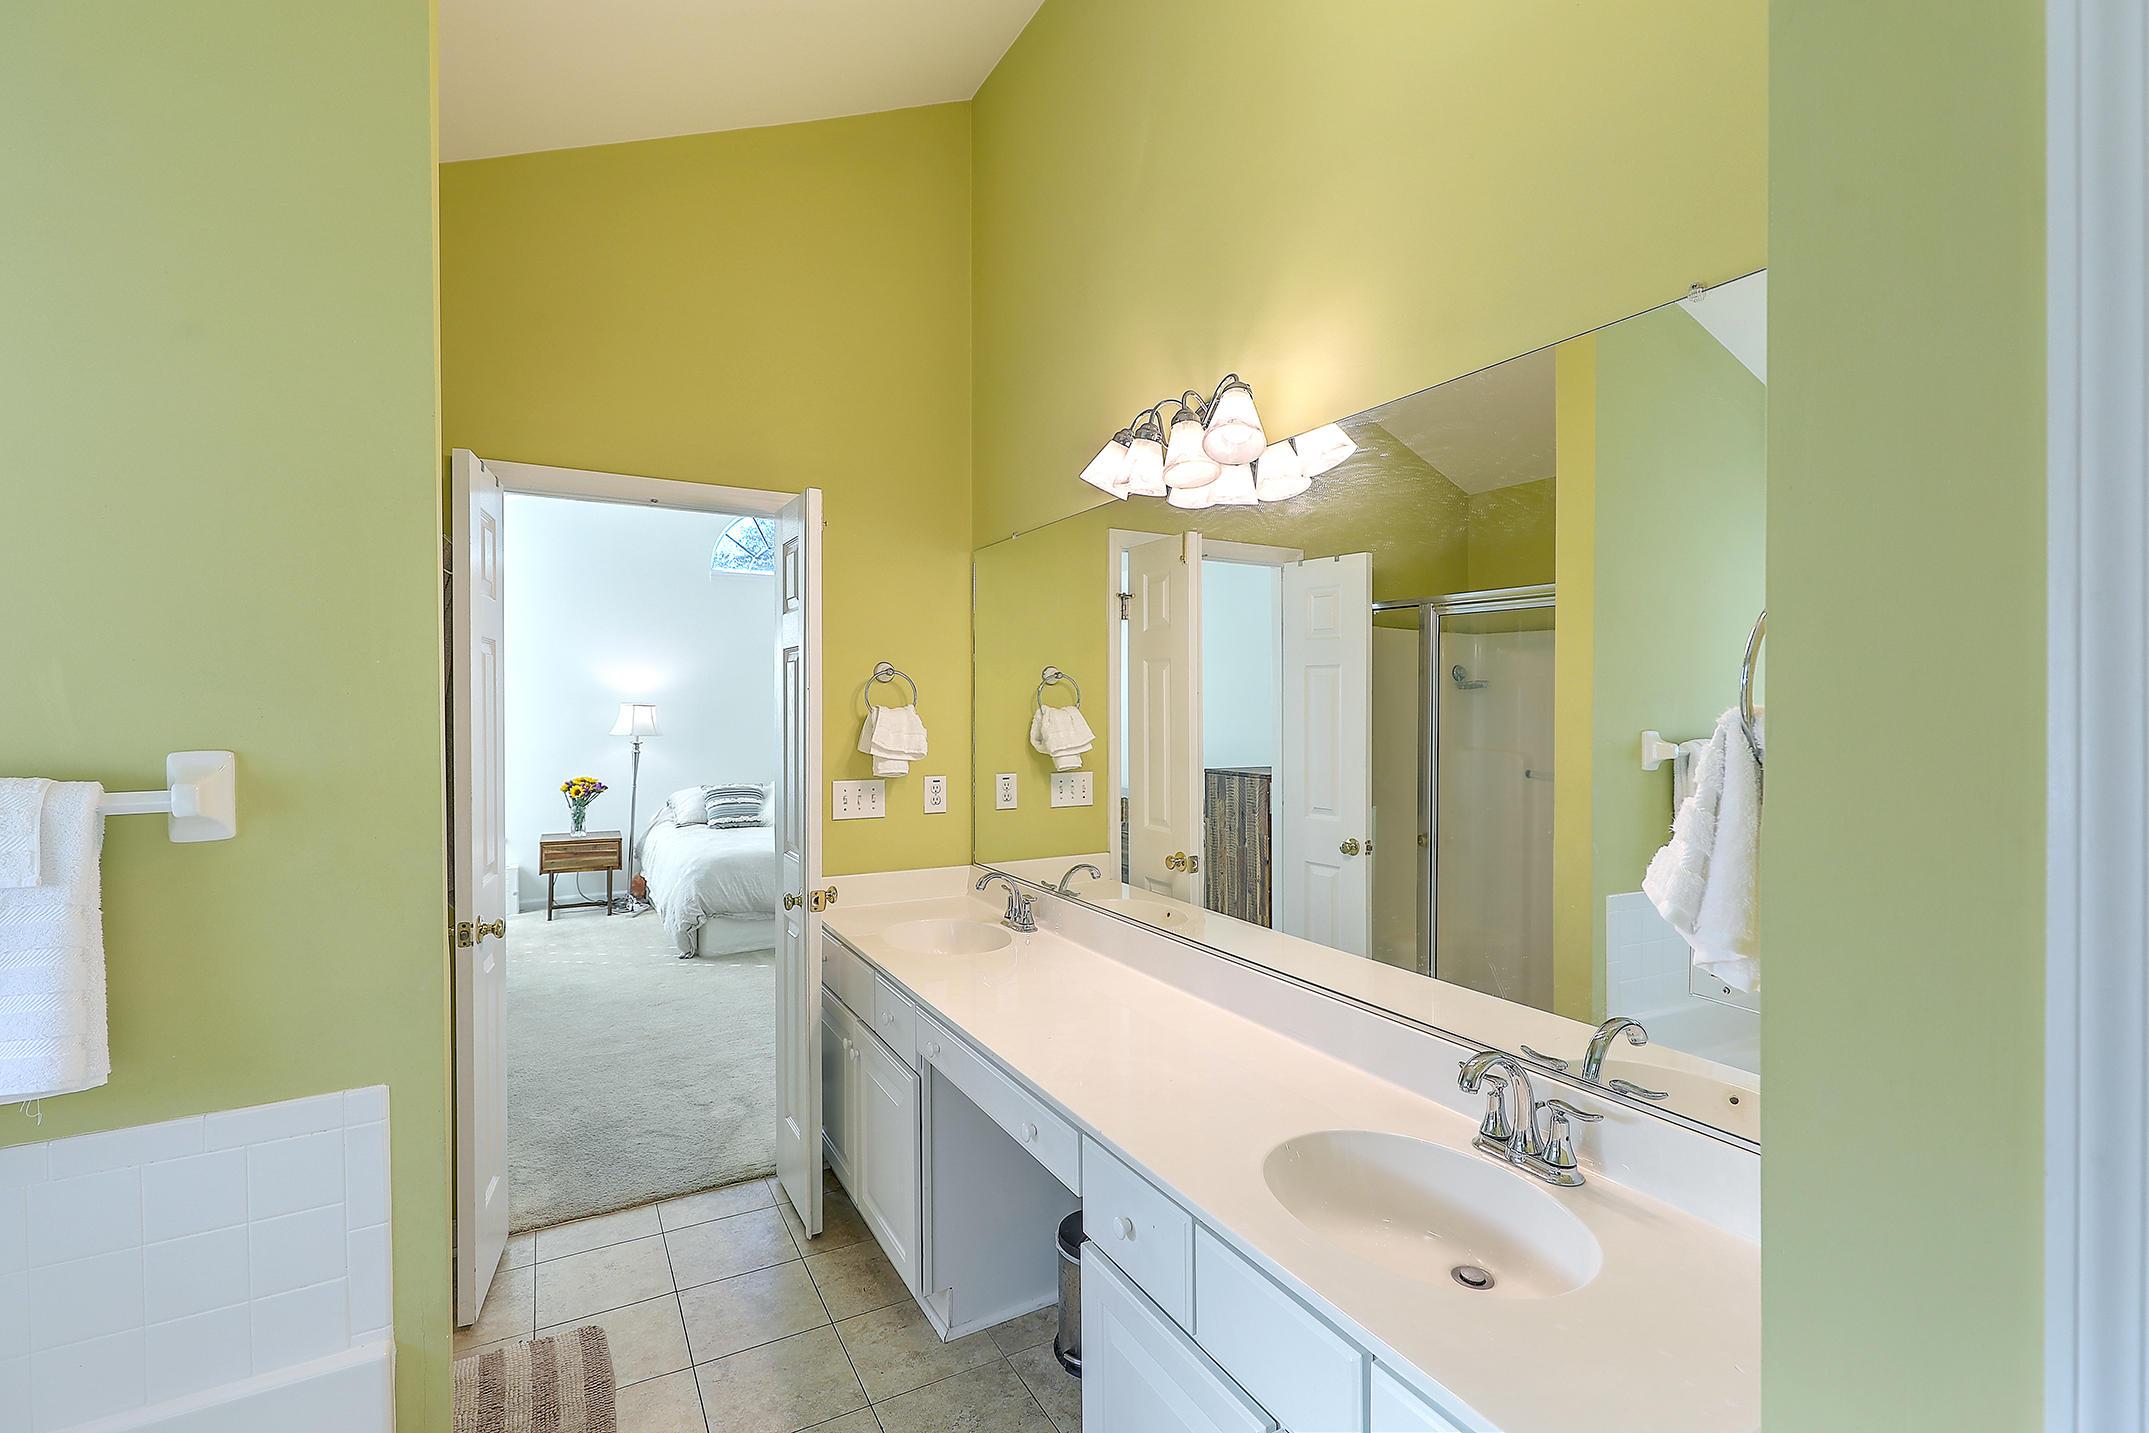 Dunes West Homes For Sale - 1471 Cypress Pointe, Mount Pleasant, SC - 39